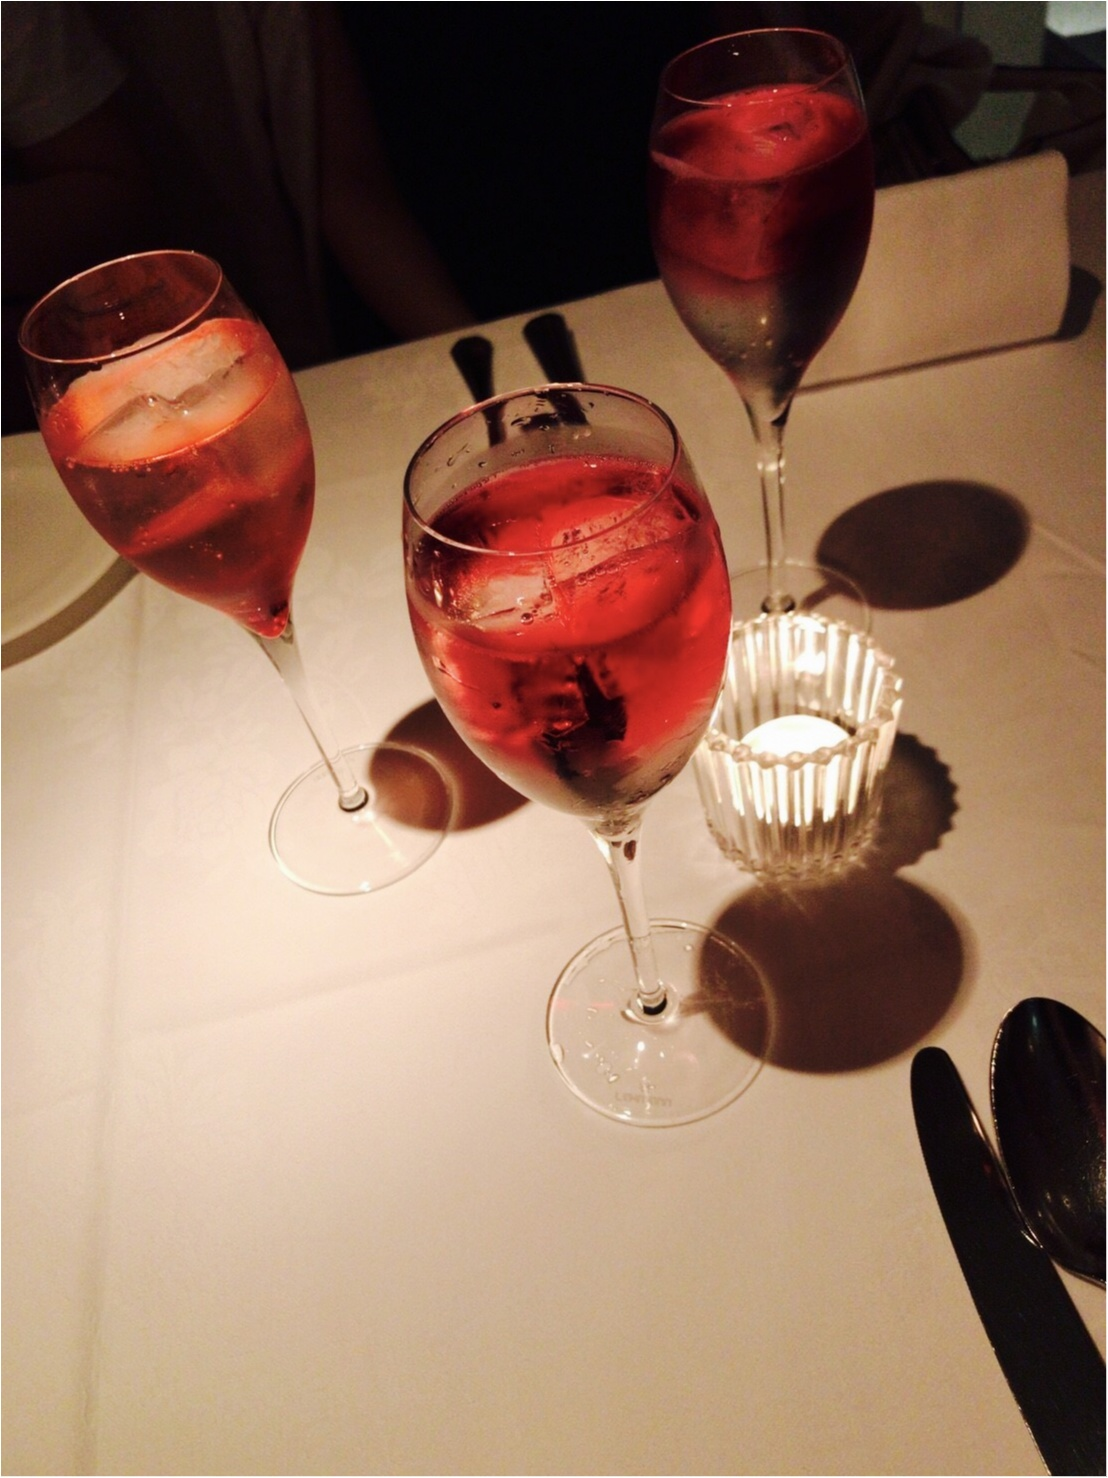 【AUXAMIS TOKYO】東京駅丸ビル35階絶景のフレンチレストランで誕生日ディナー♡_4